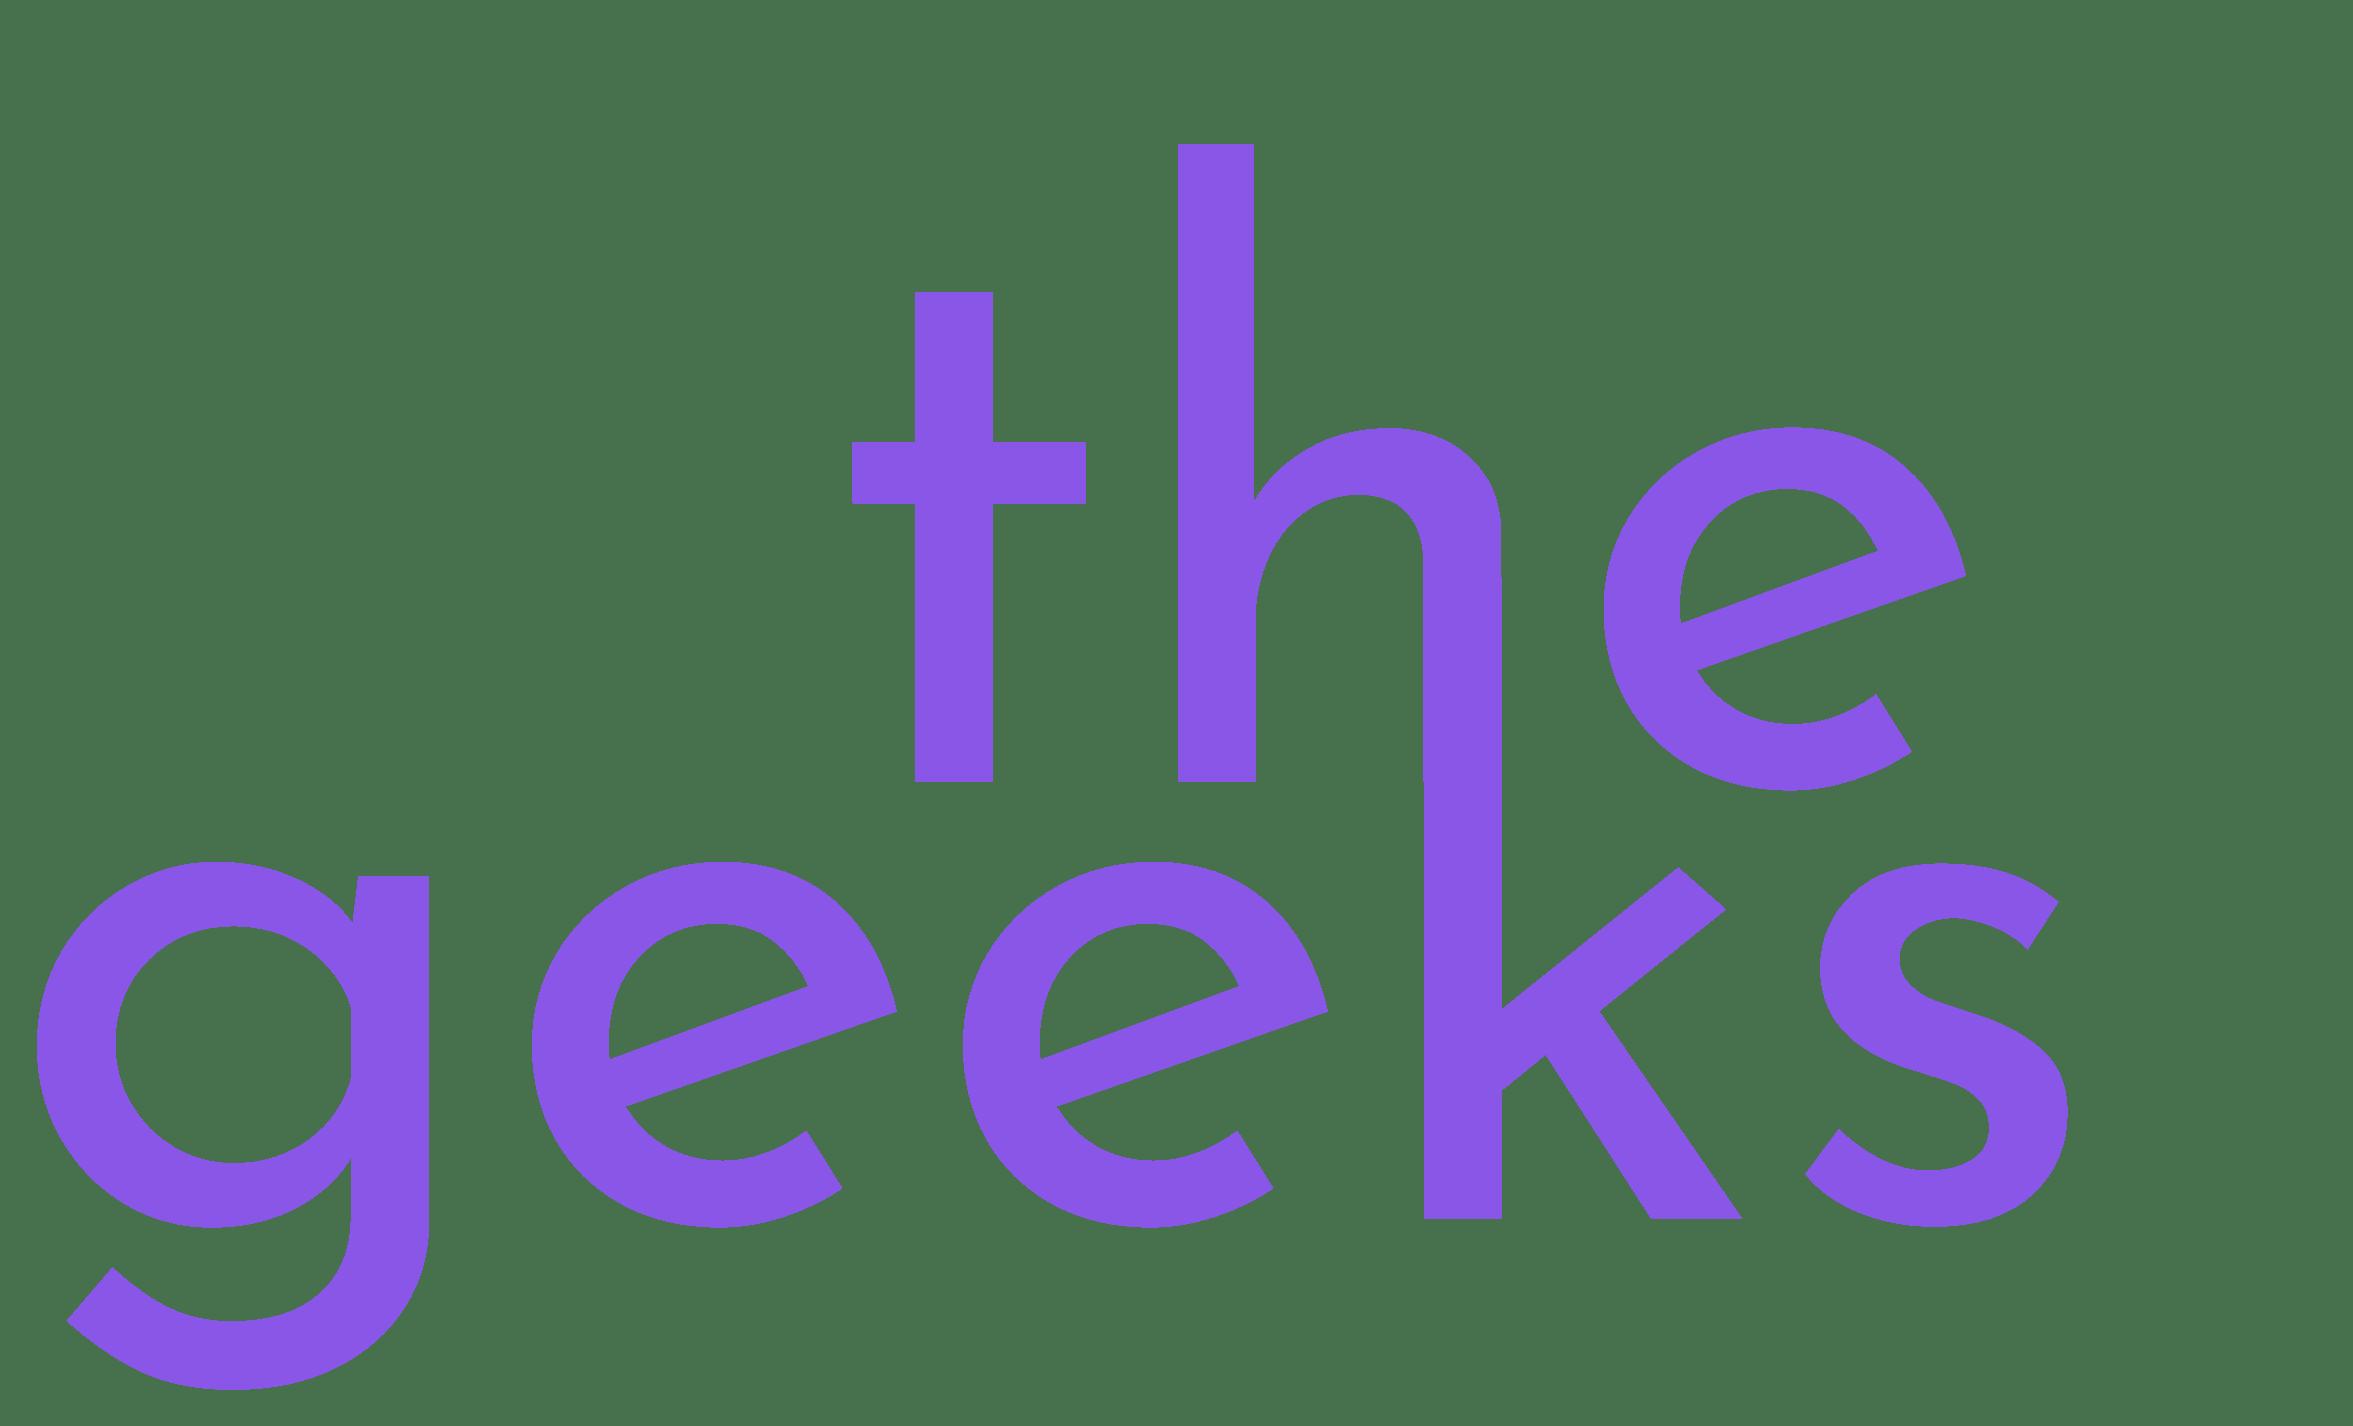 The Geeks Logo